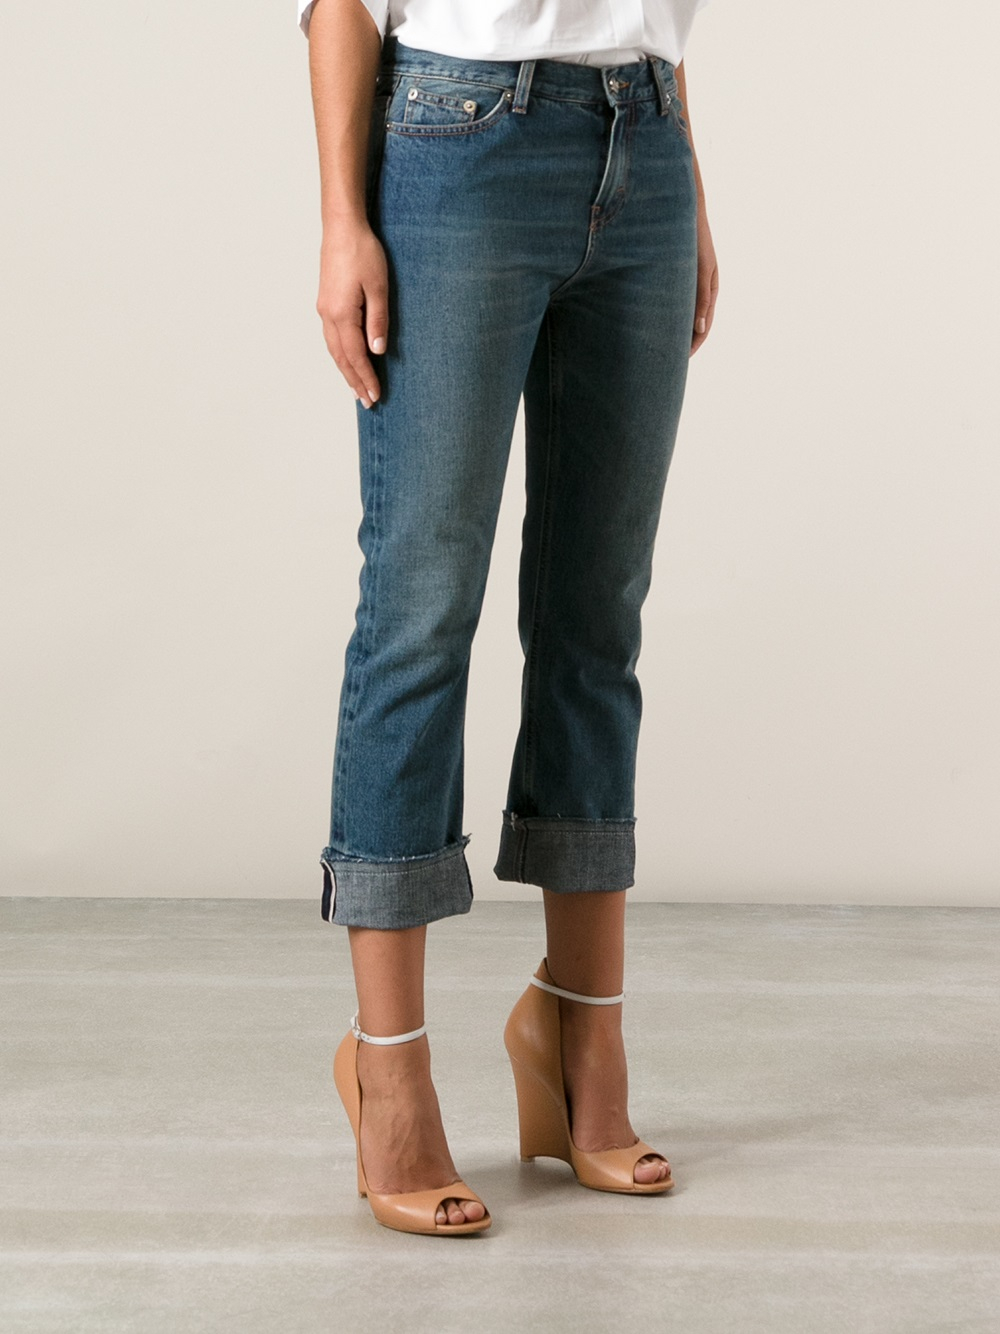 erika cavallini semi couture cropped slim fit jean in blue. Black Bedroom Furniture Sets. Home Design Ideas